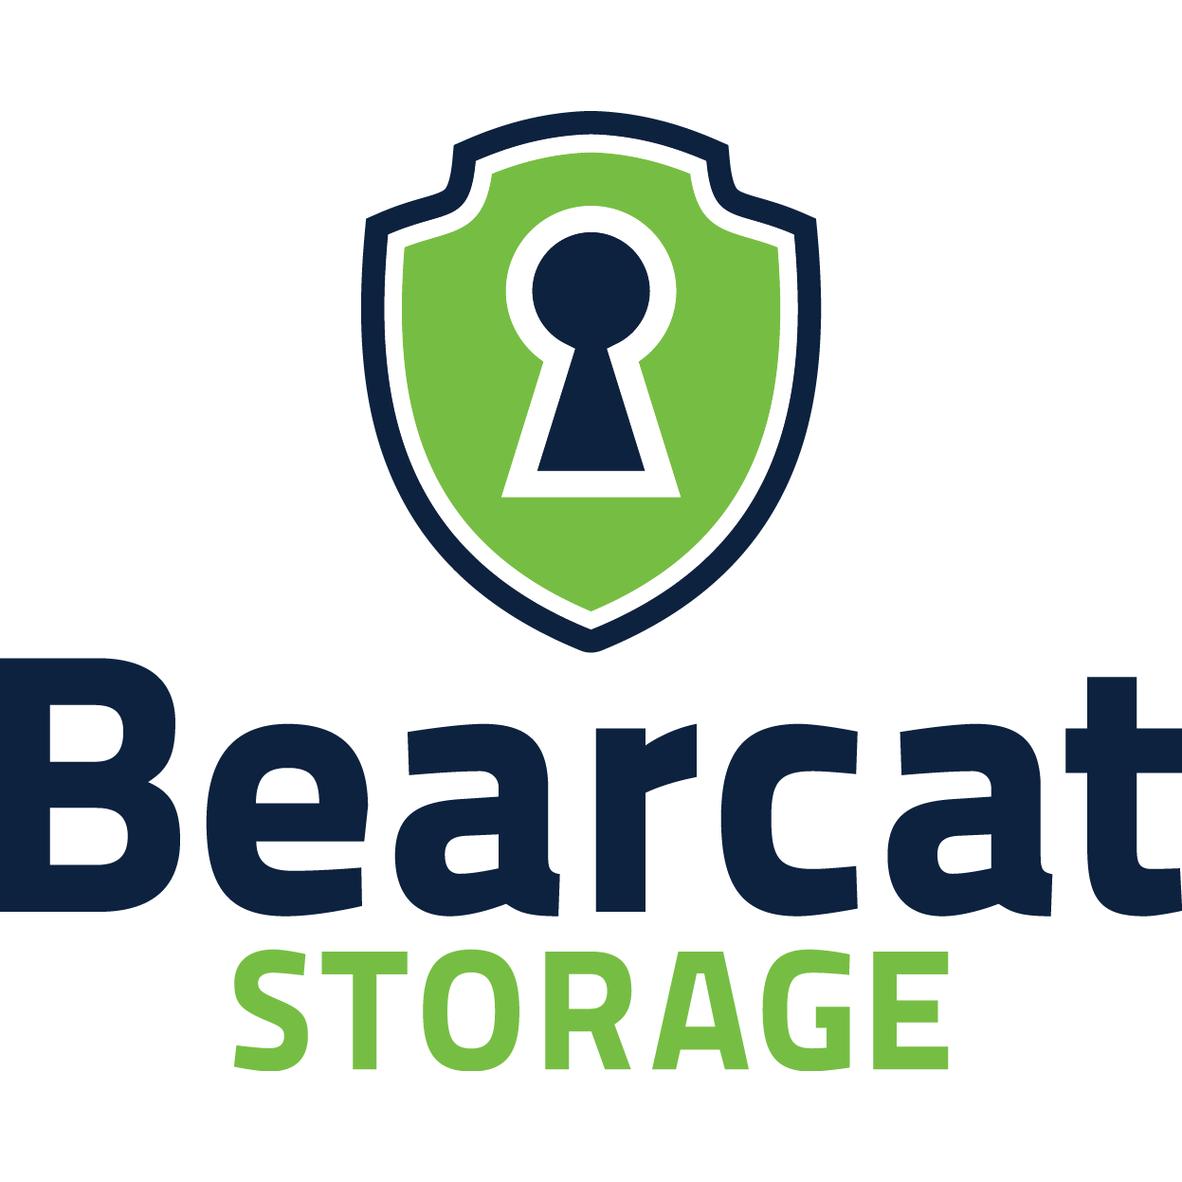 Self-Storage Facility in OH Cincinnati 45238 BEARCAT STORAGE - DELHI 5291 Delhi Ave.  (513)347-0999